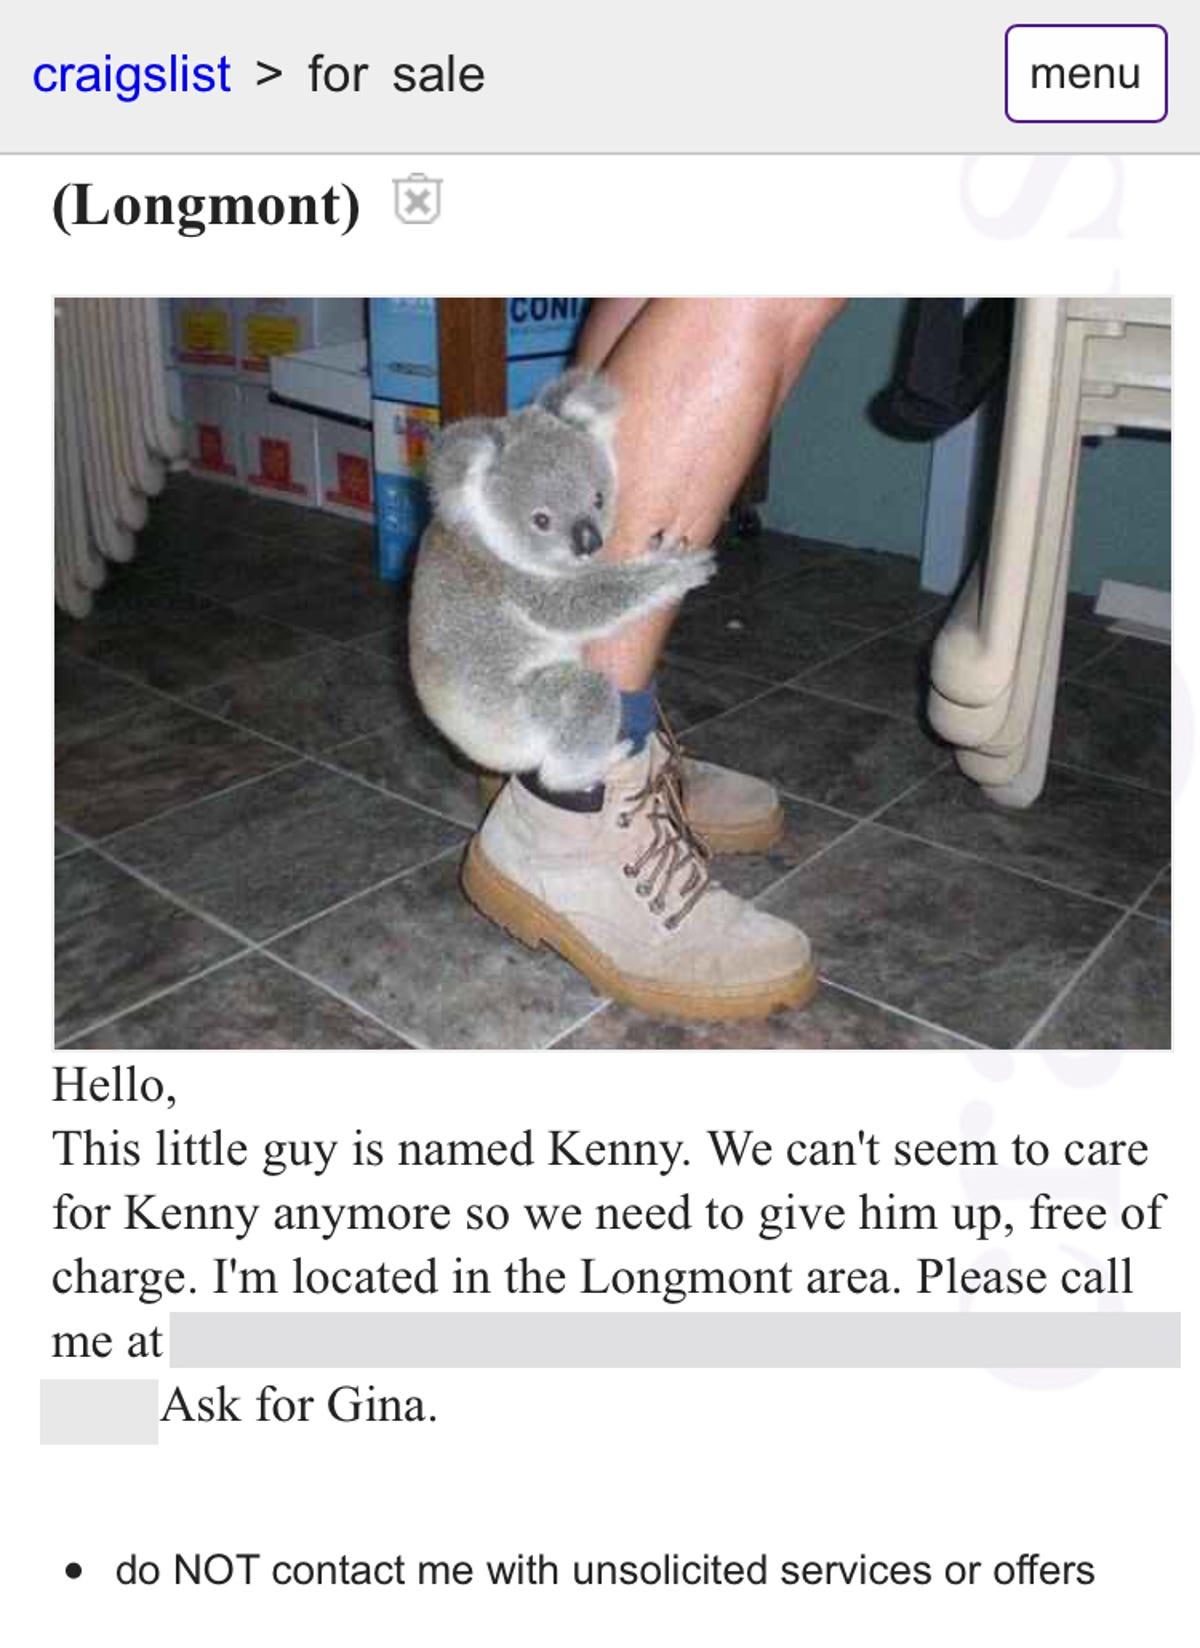 Craigslist prank goes wrong: Woman does not have koala